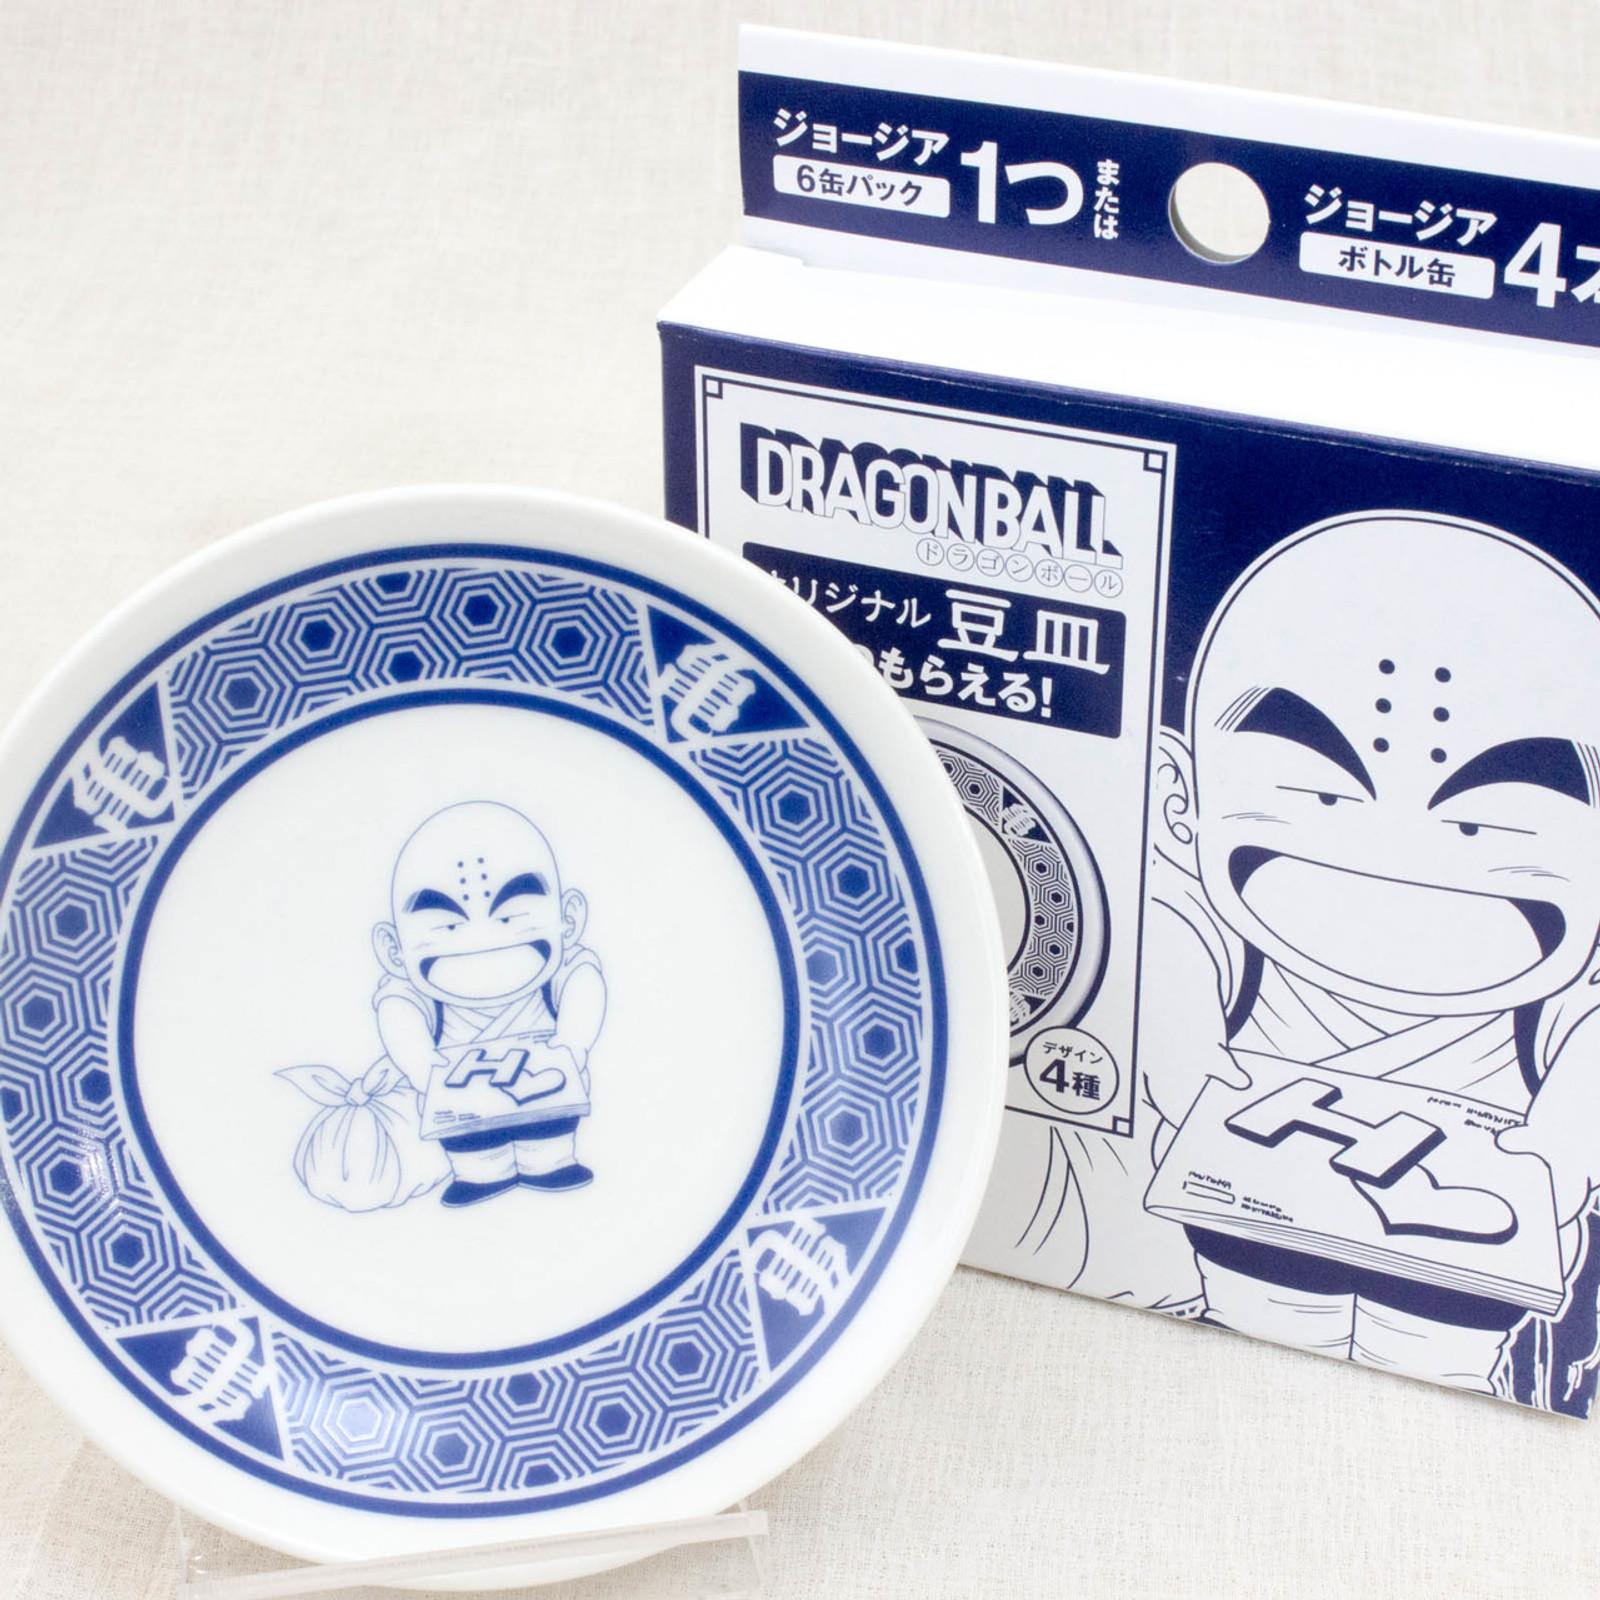 Dragon Ball Small Plate Dish Krillin JAPAN GEORGIA ANIME1